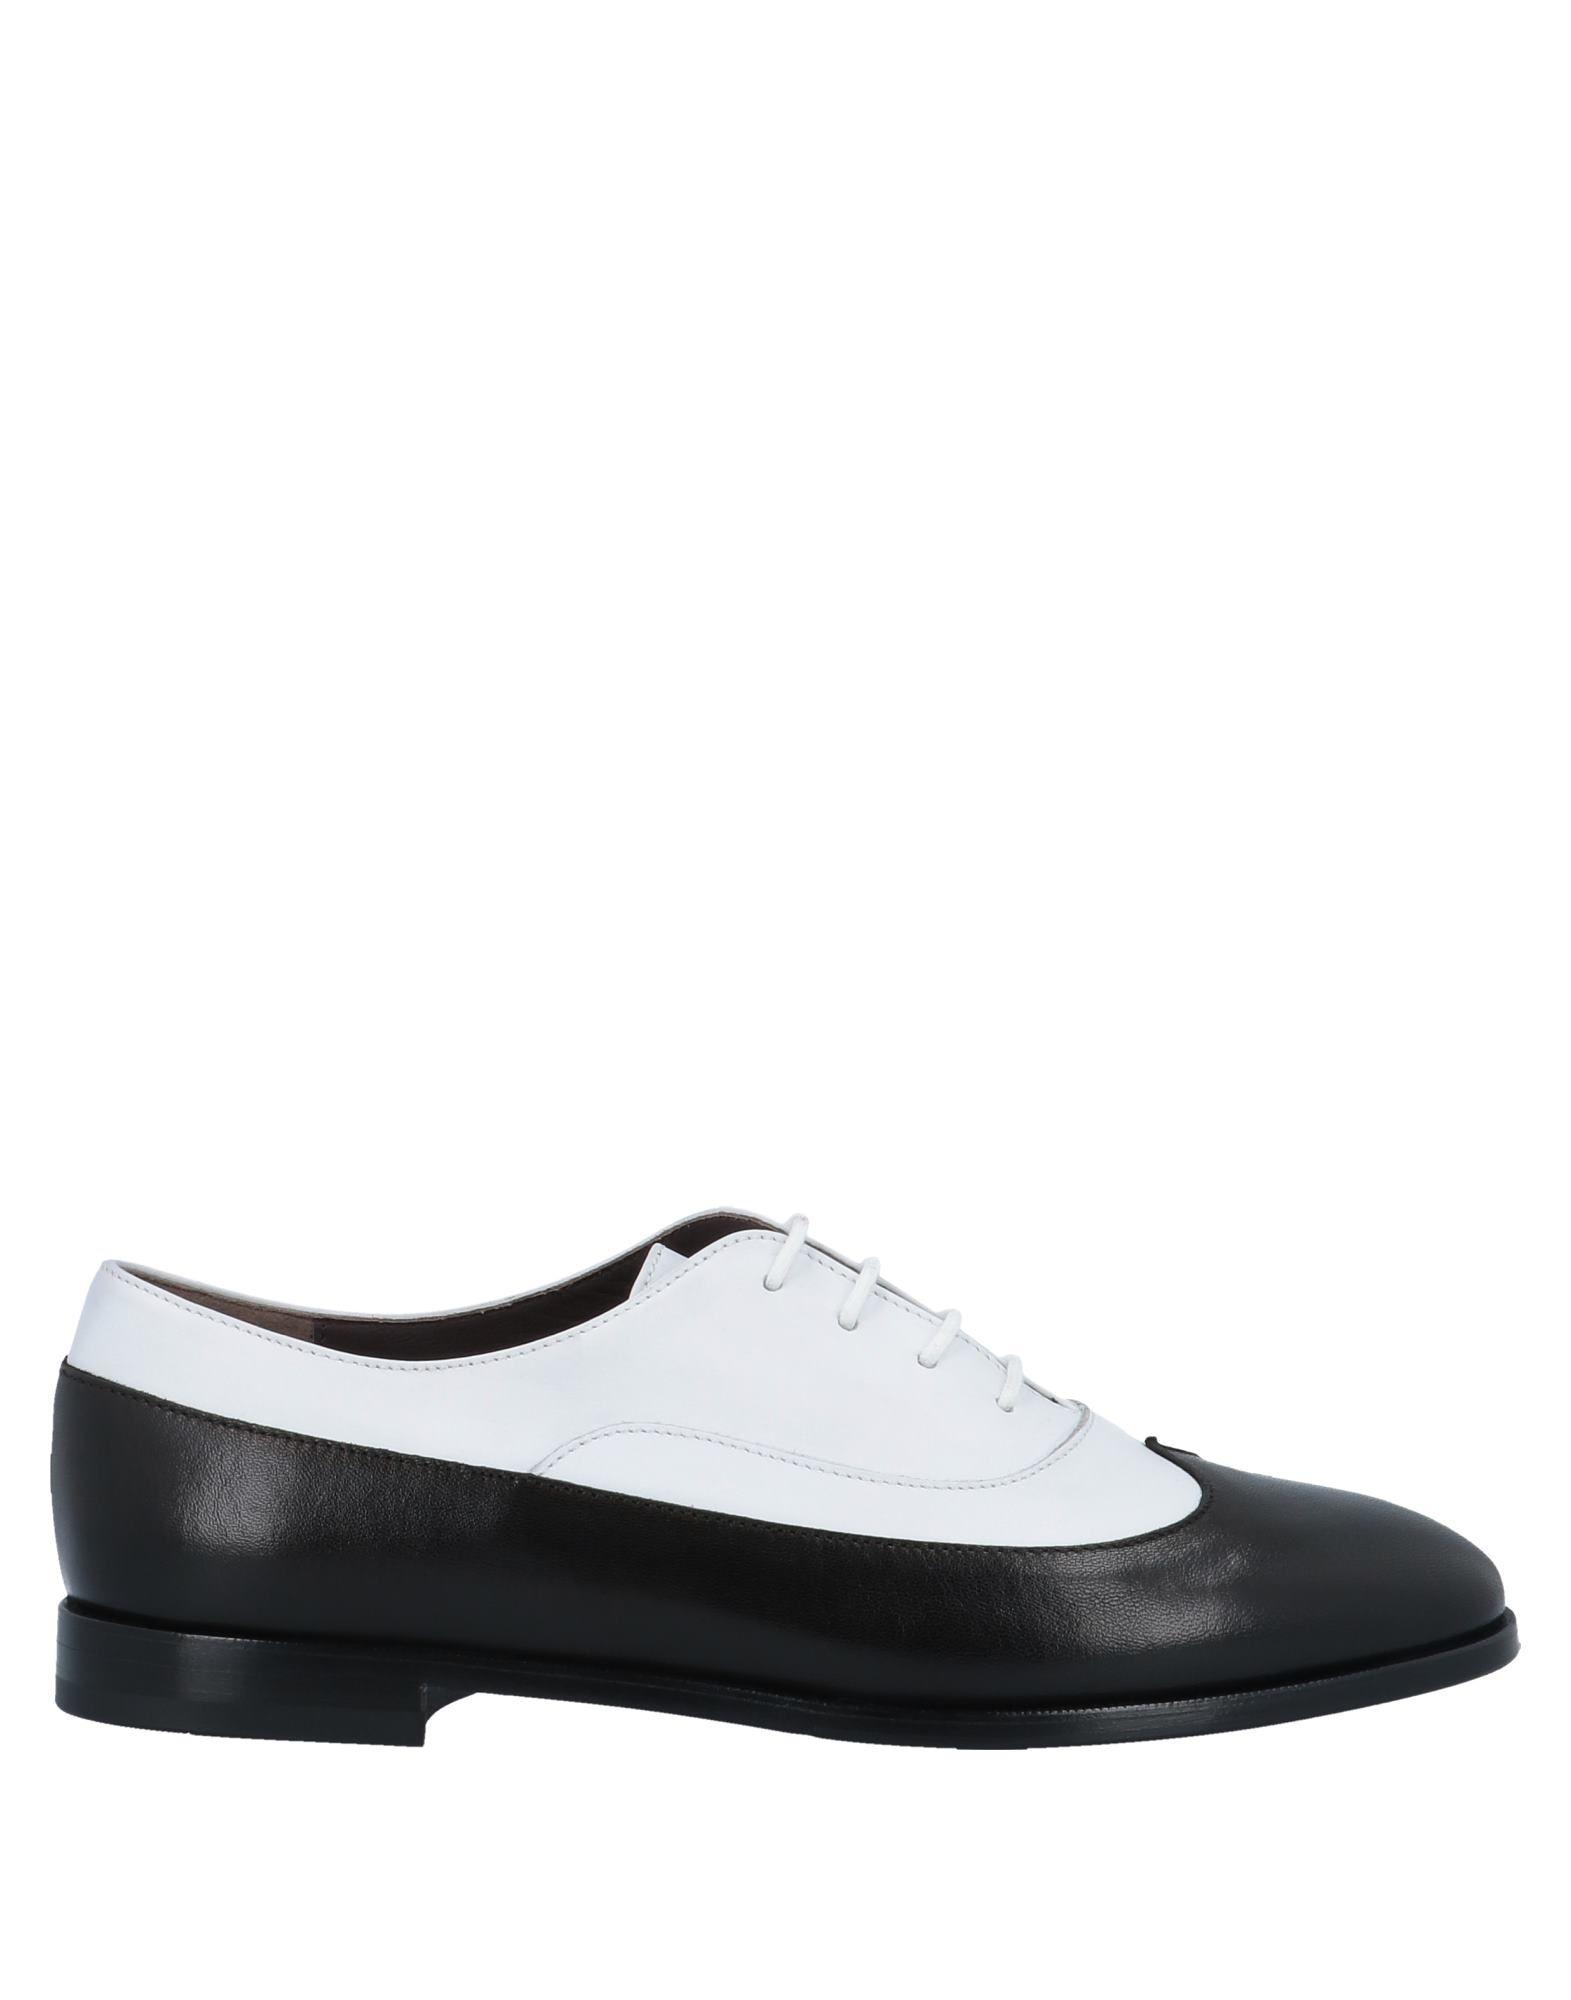 MAGLI by BRUNO MAGLI Обувь на шнурках